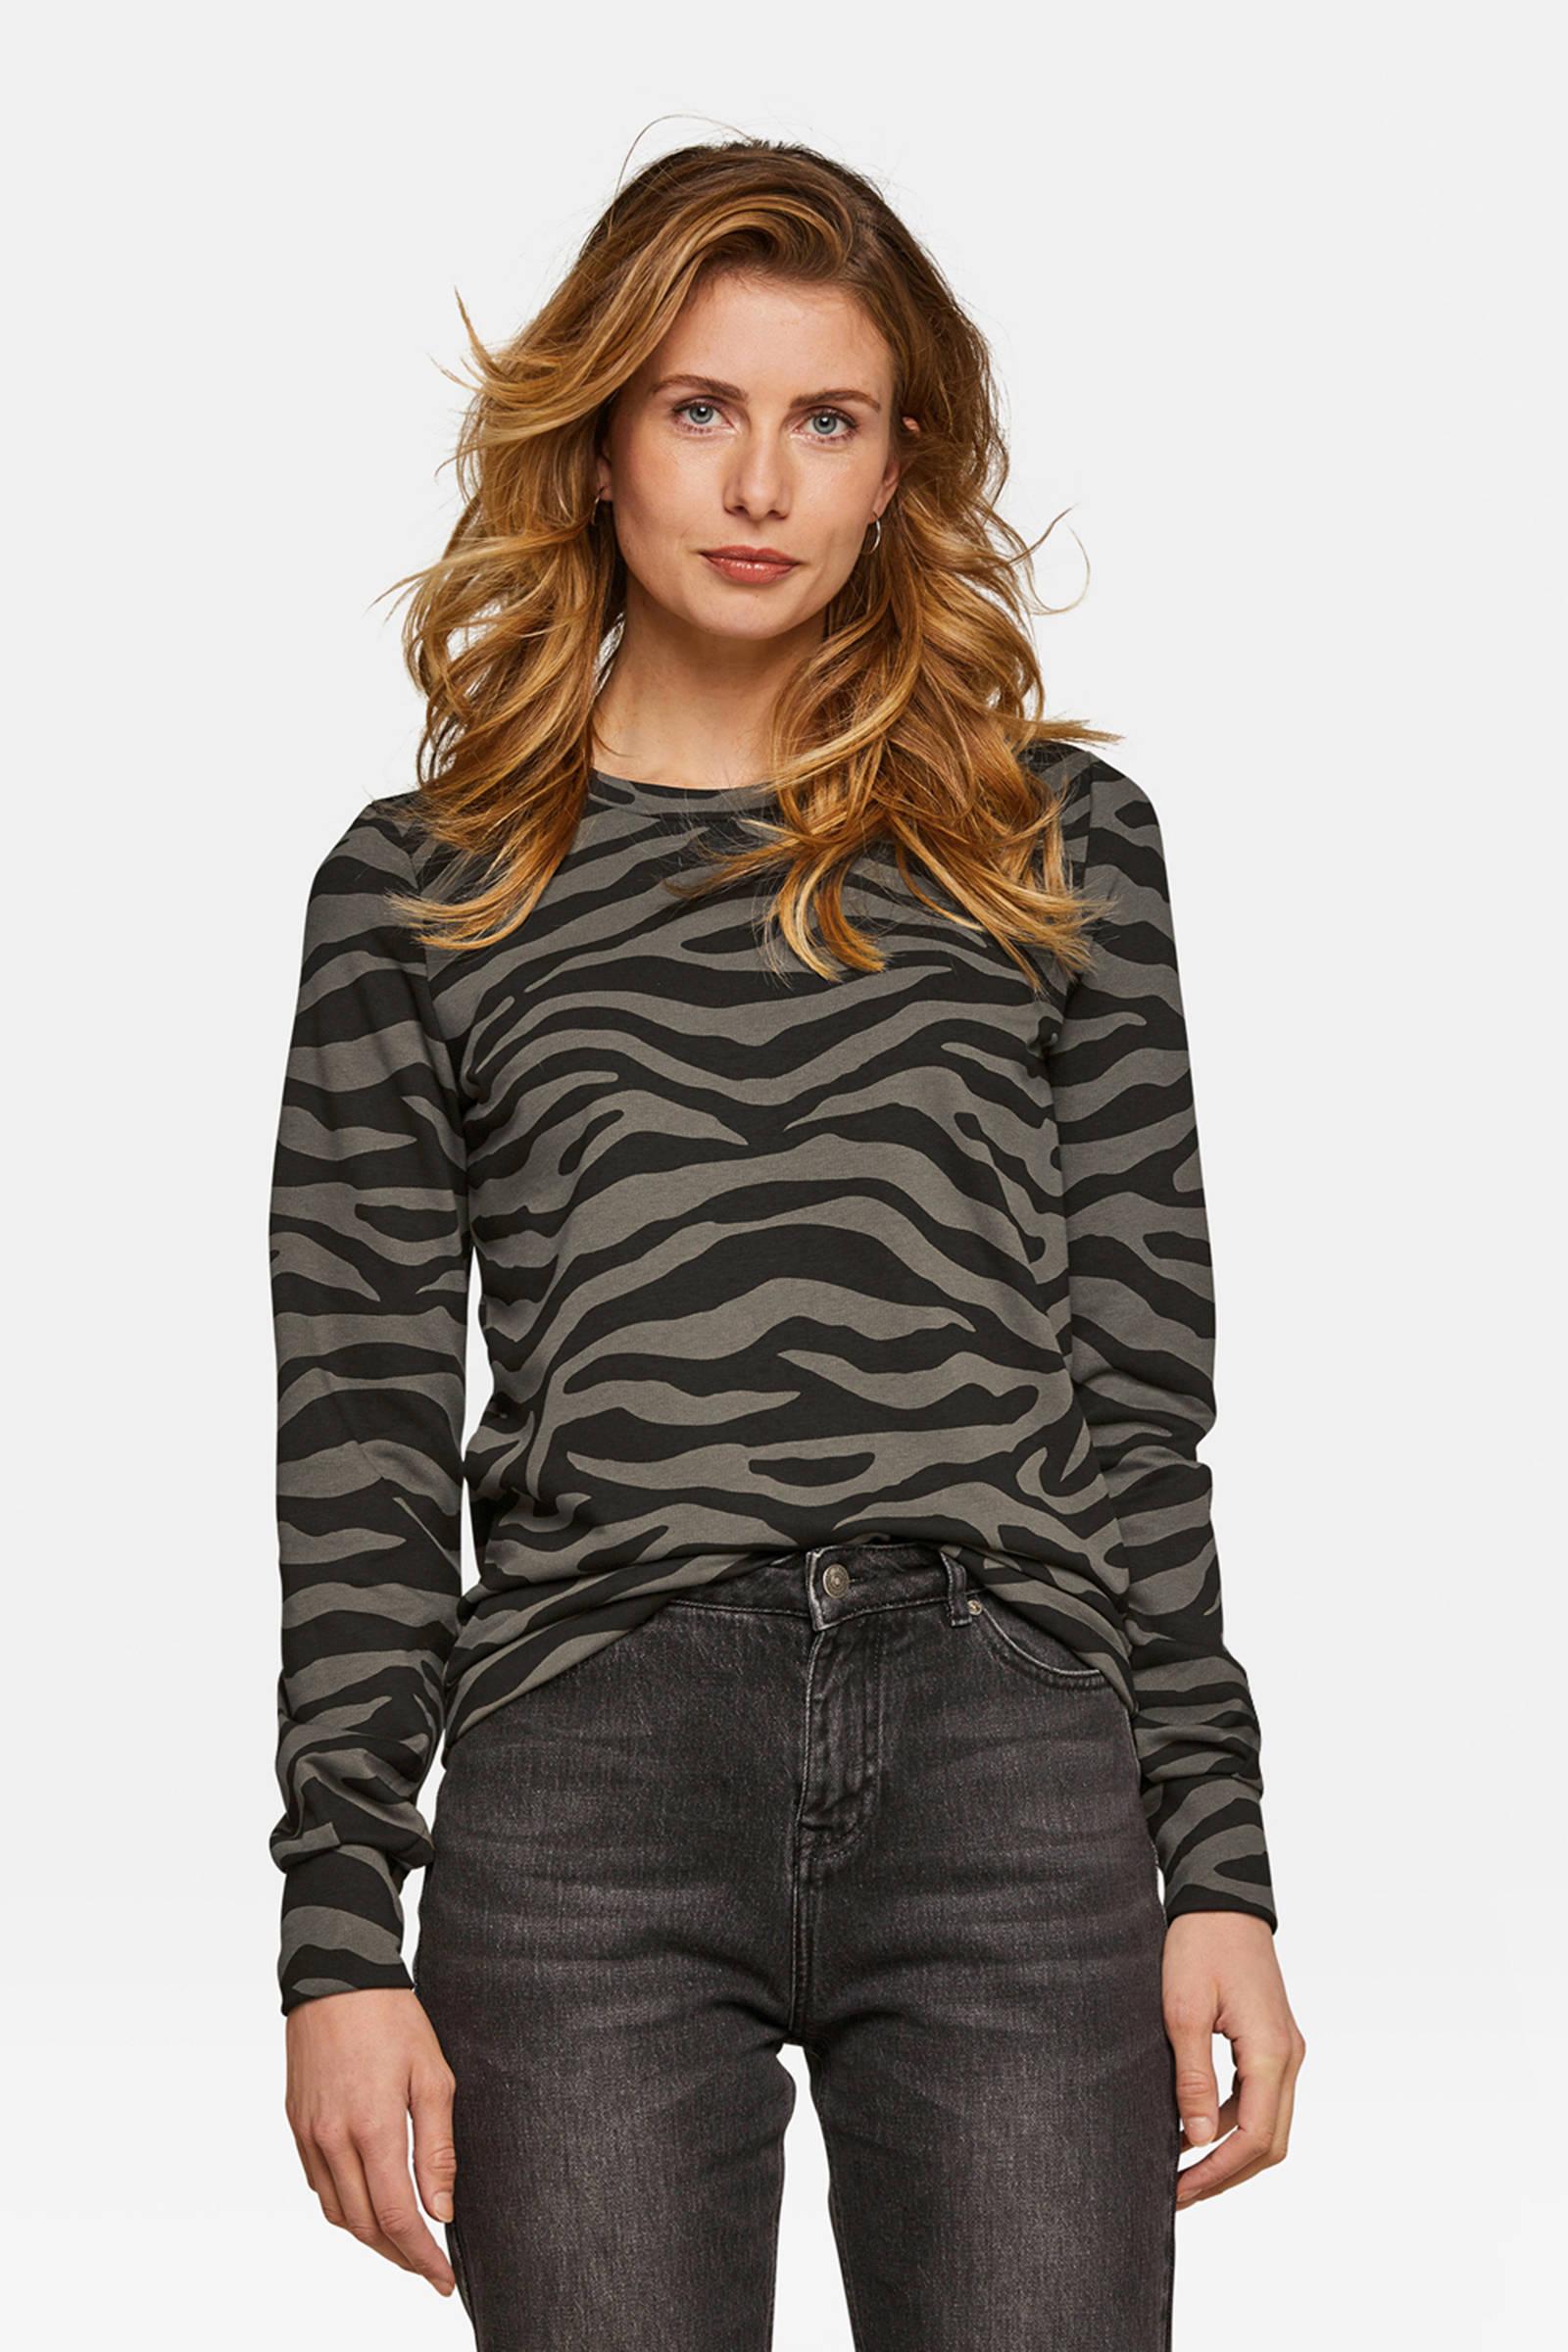 tijgerprint sweater sweater Fashion WE met WE tijgerprint met WE Fashion Fashion 5wAgwq